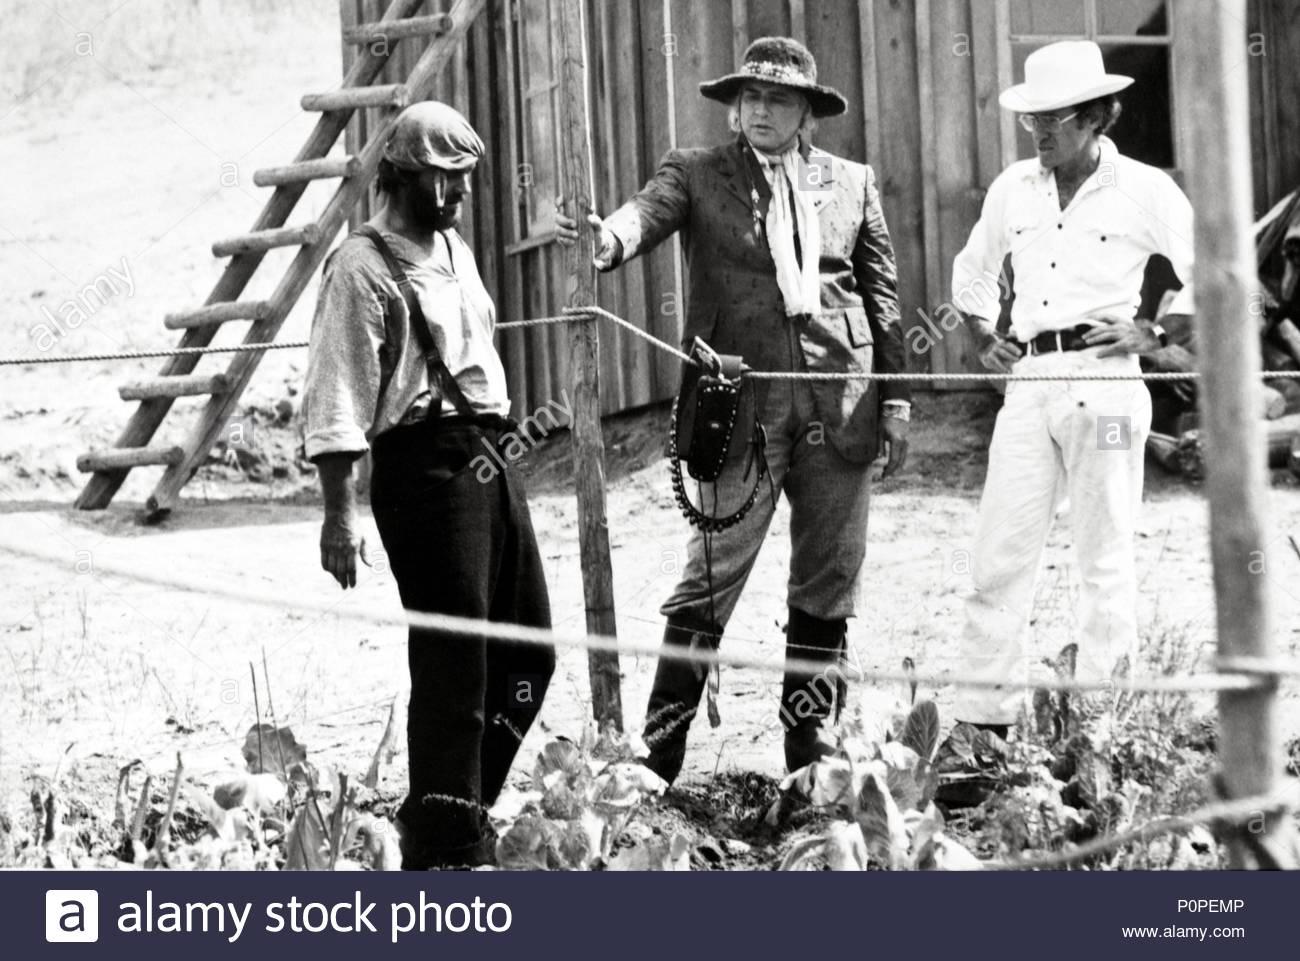 Original Film Title: THE MISSOURI BREAKS.  English Title: THE MISSOURI BREAKS.  Film Director: ARTHUR PENN.  Year: 1976.  Stars: ARTHUR PENN; JACK NICHOLSON; MARLON BRANDO. Credit: UNITED ARTISTS / Album - Stock Image